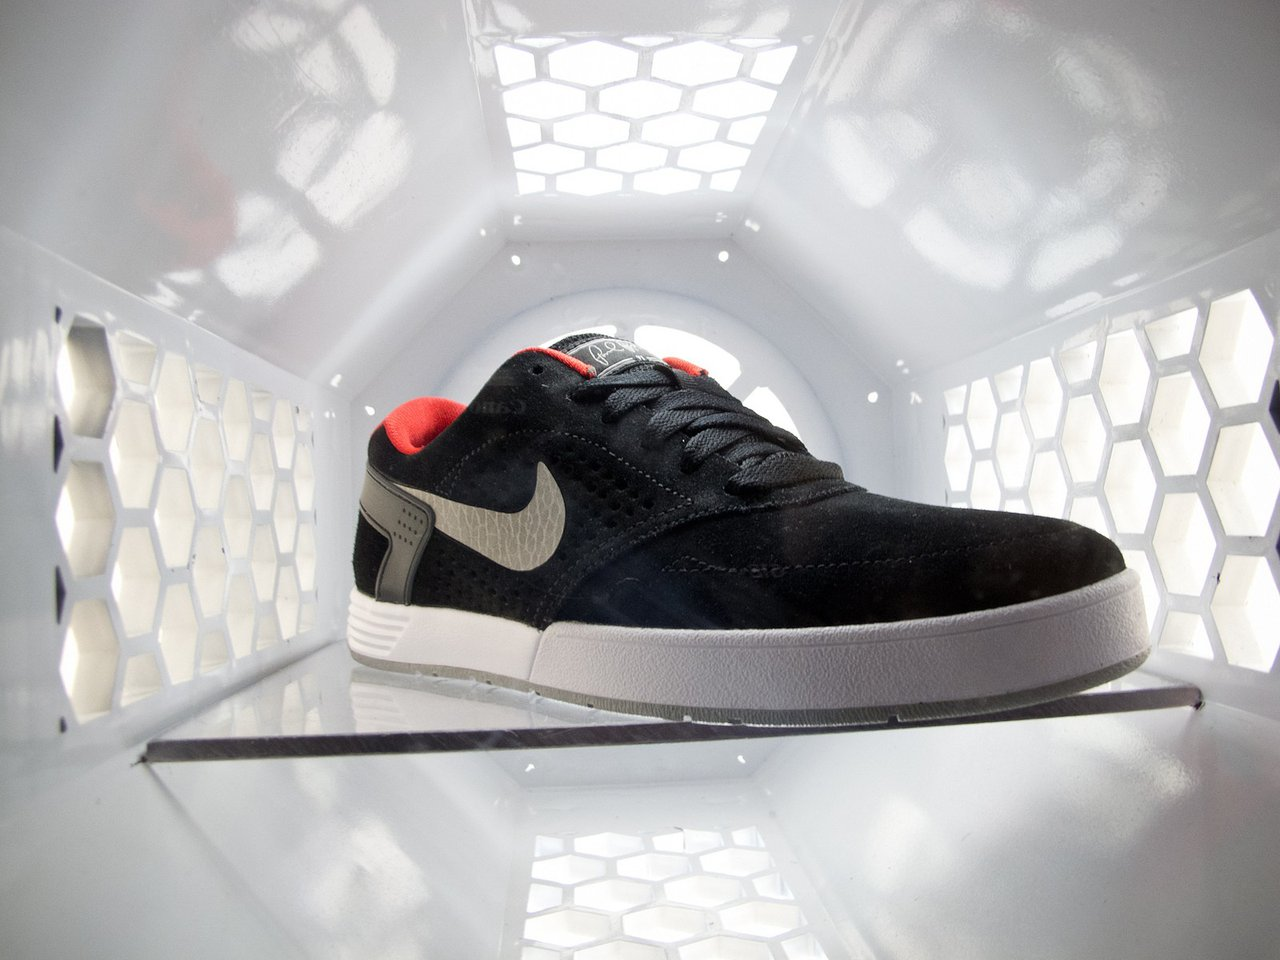 Nike 6th & Mill photo P ROD 4.jpg